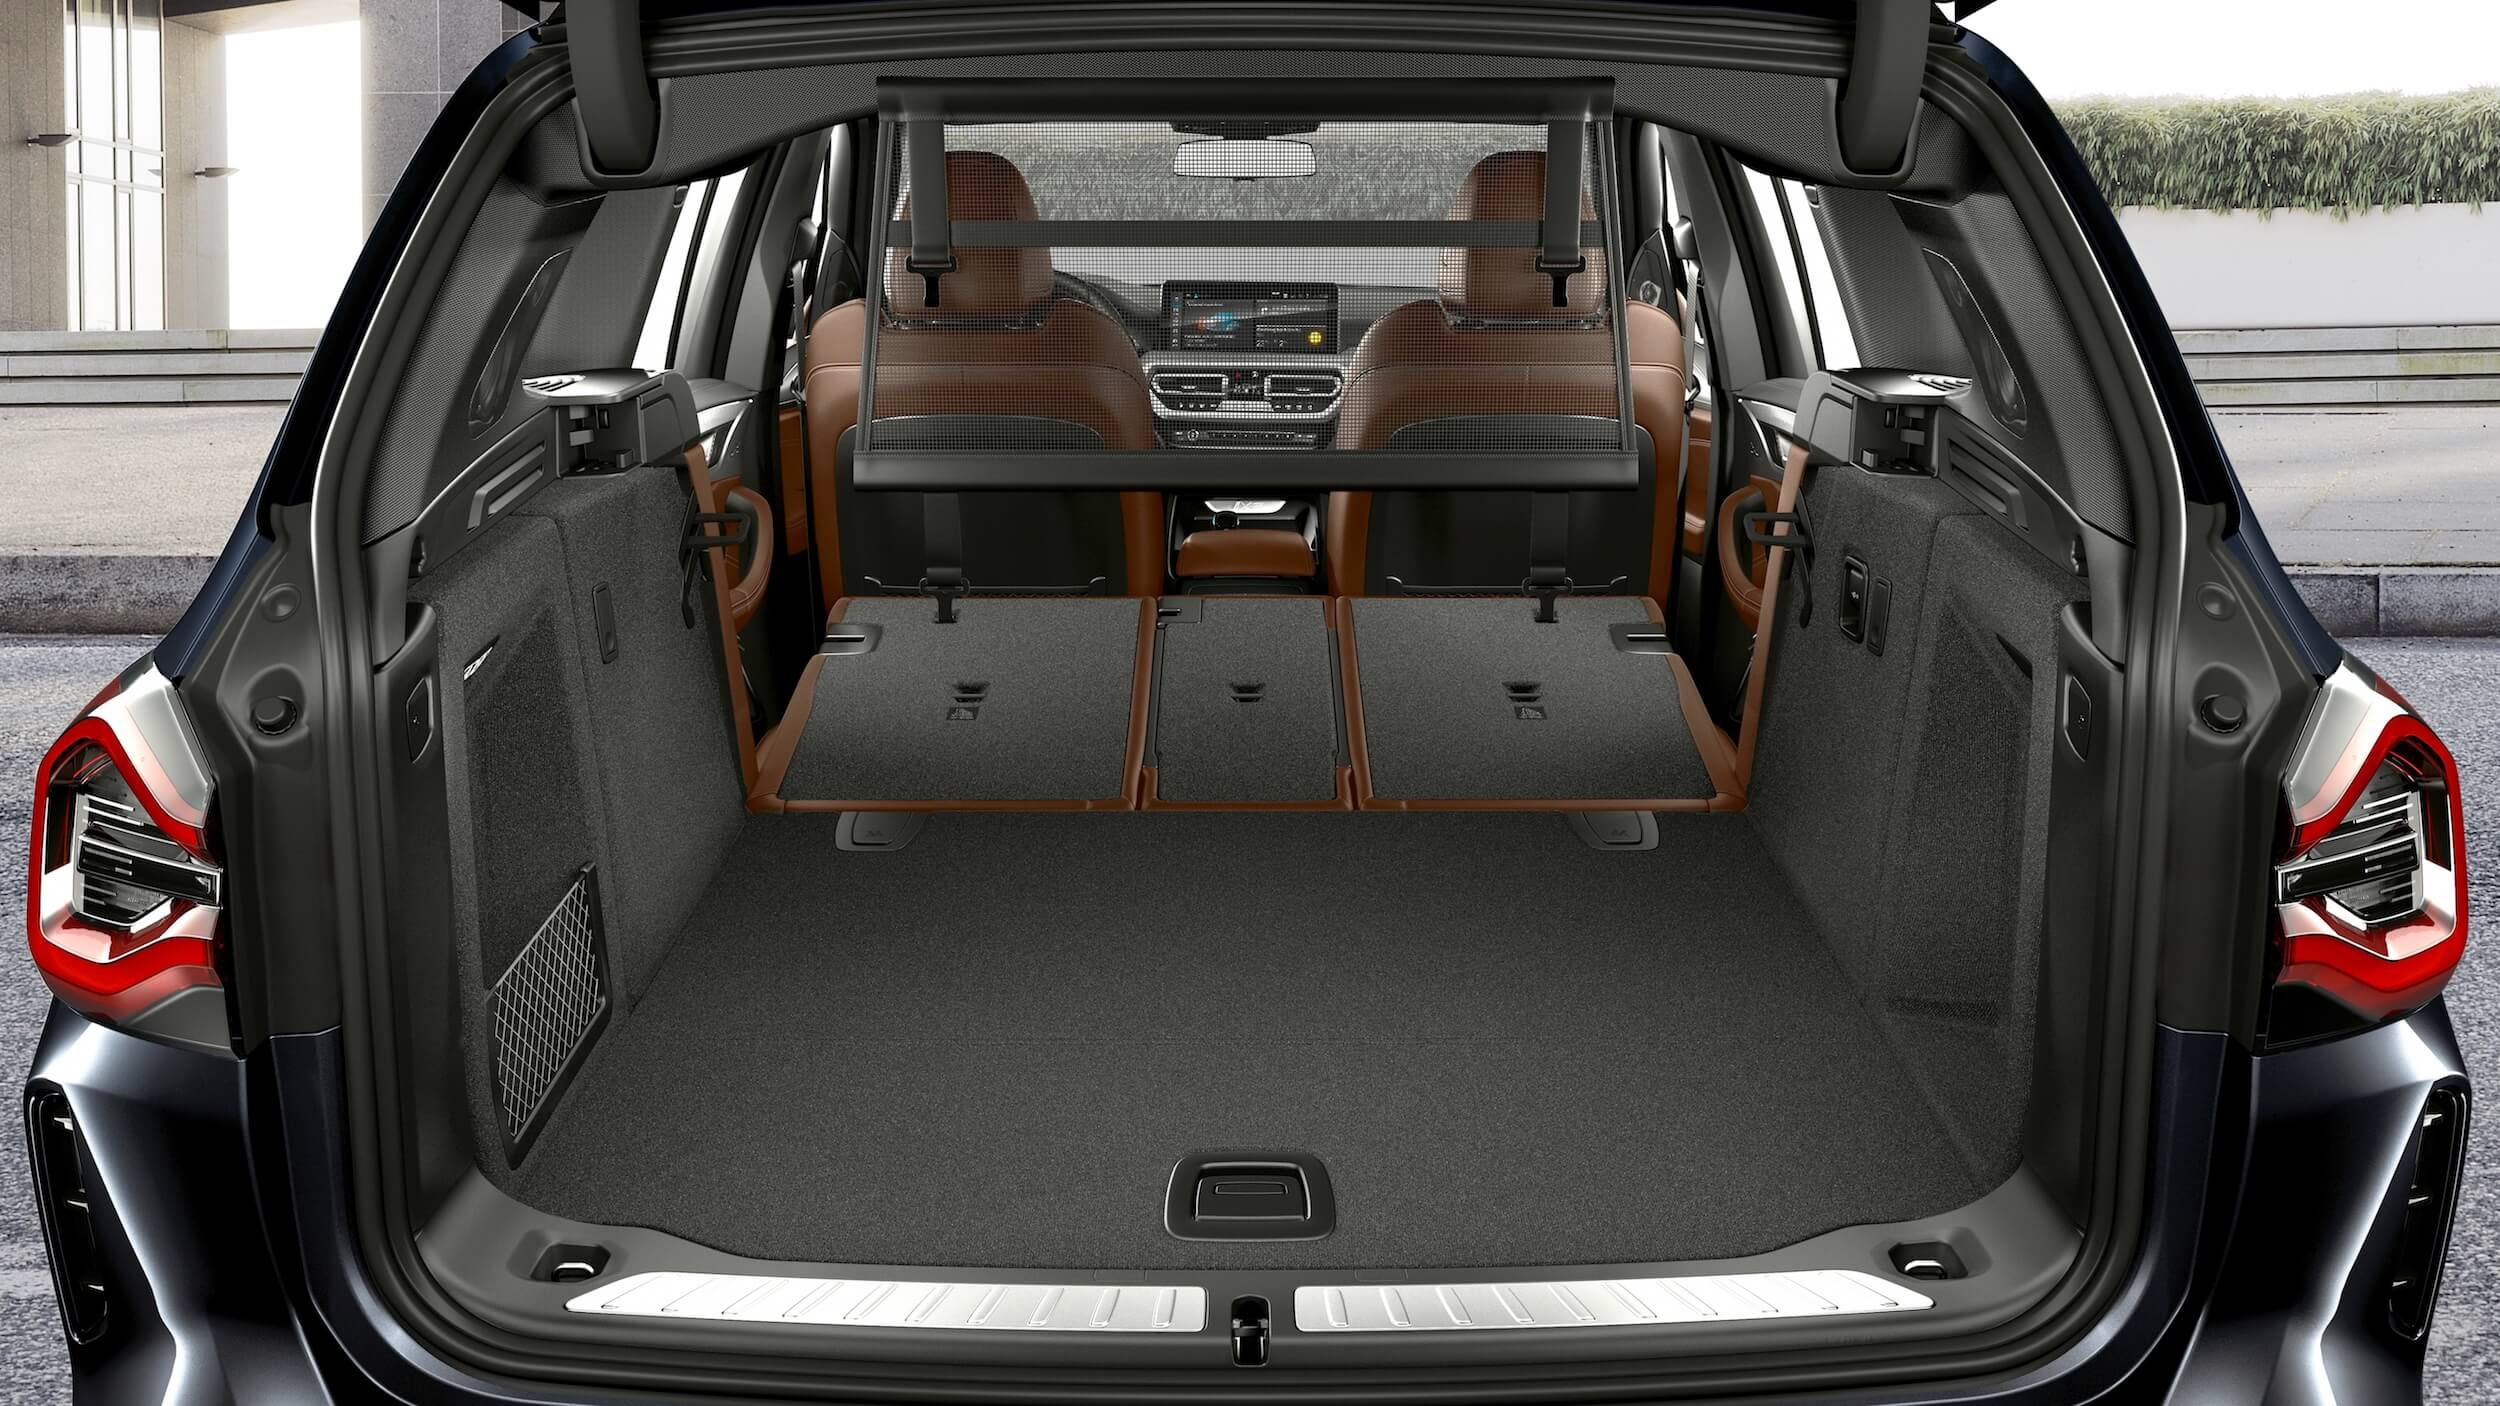 BMW iX3 koffer acherbank neergeklapt